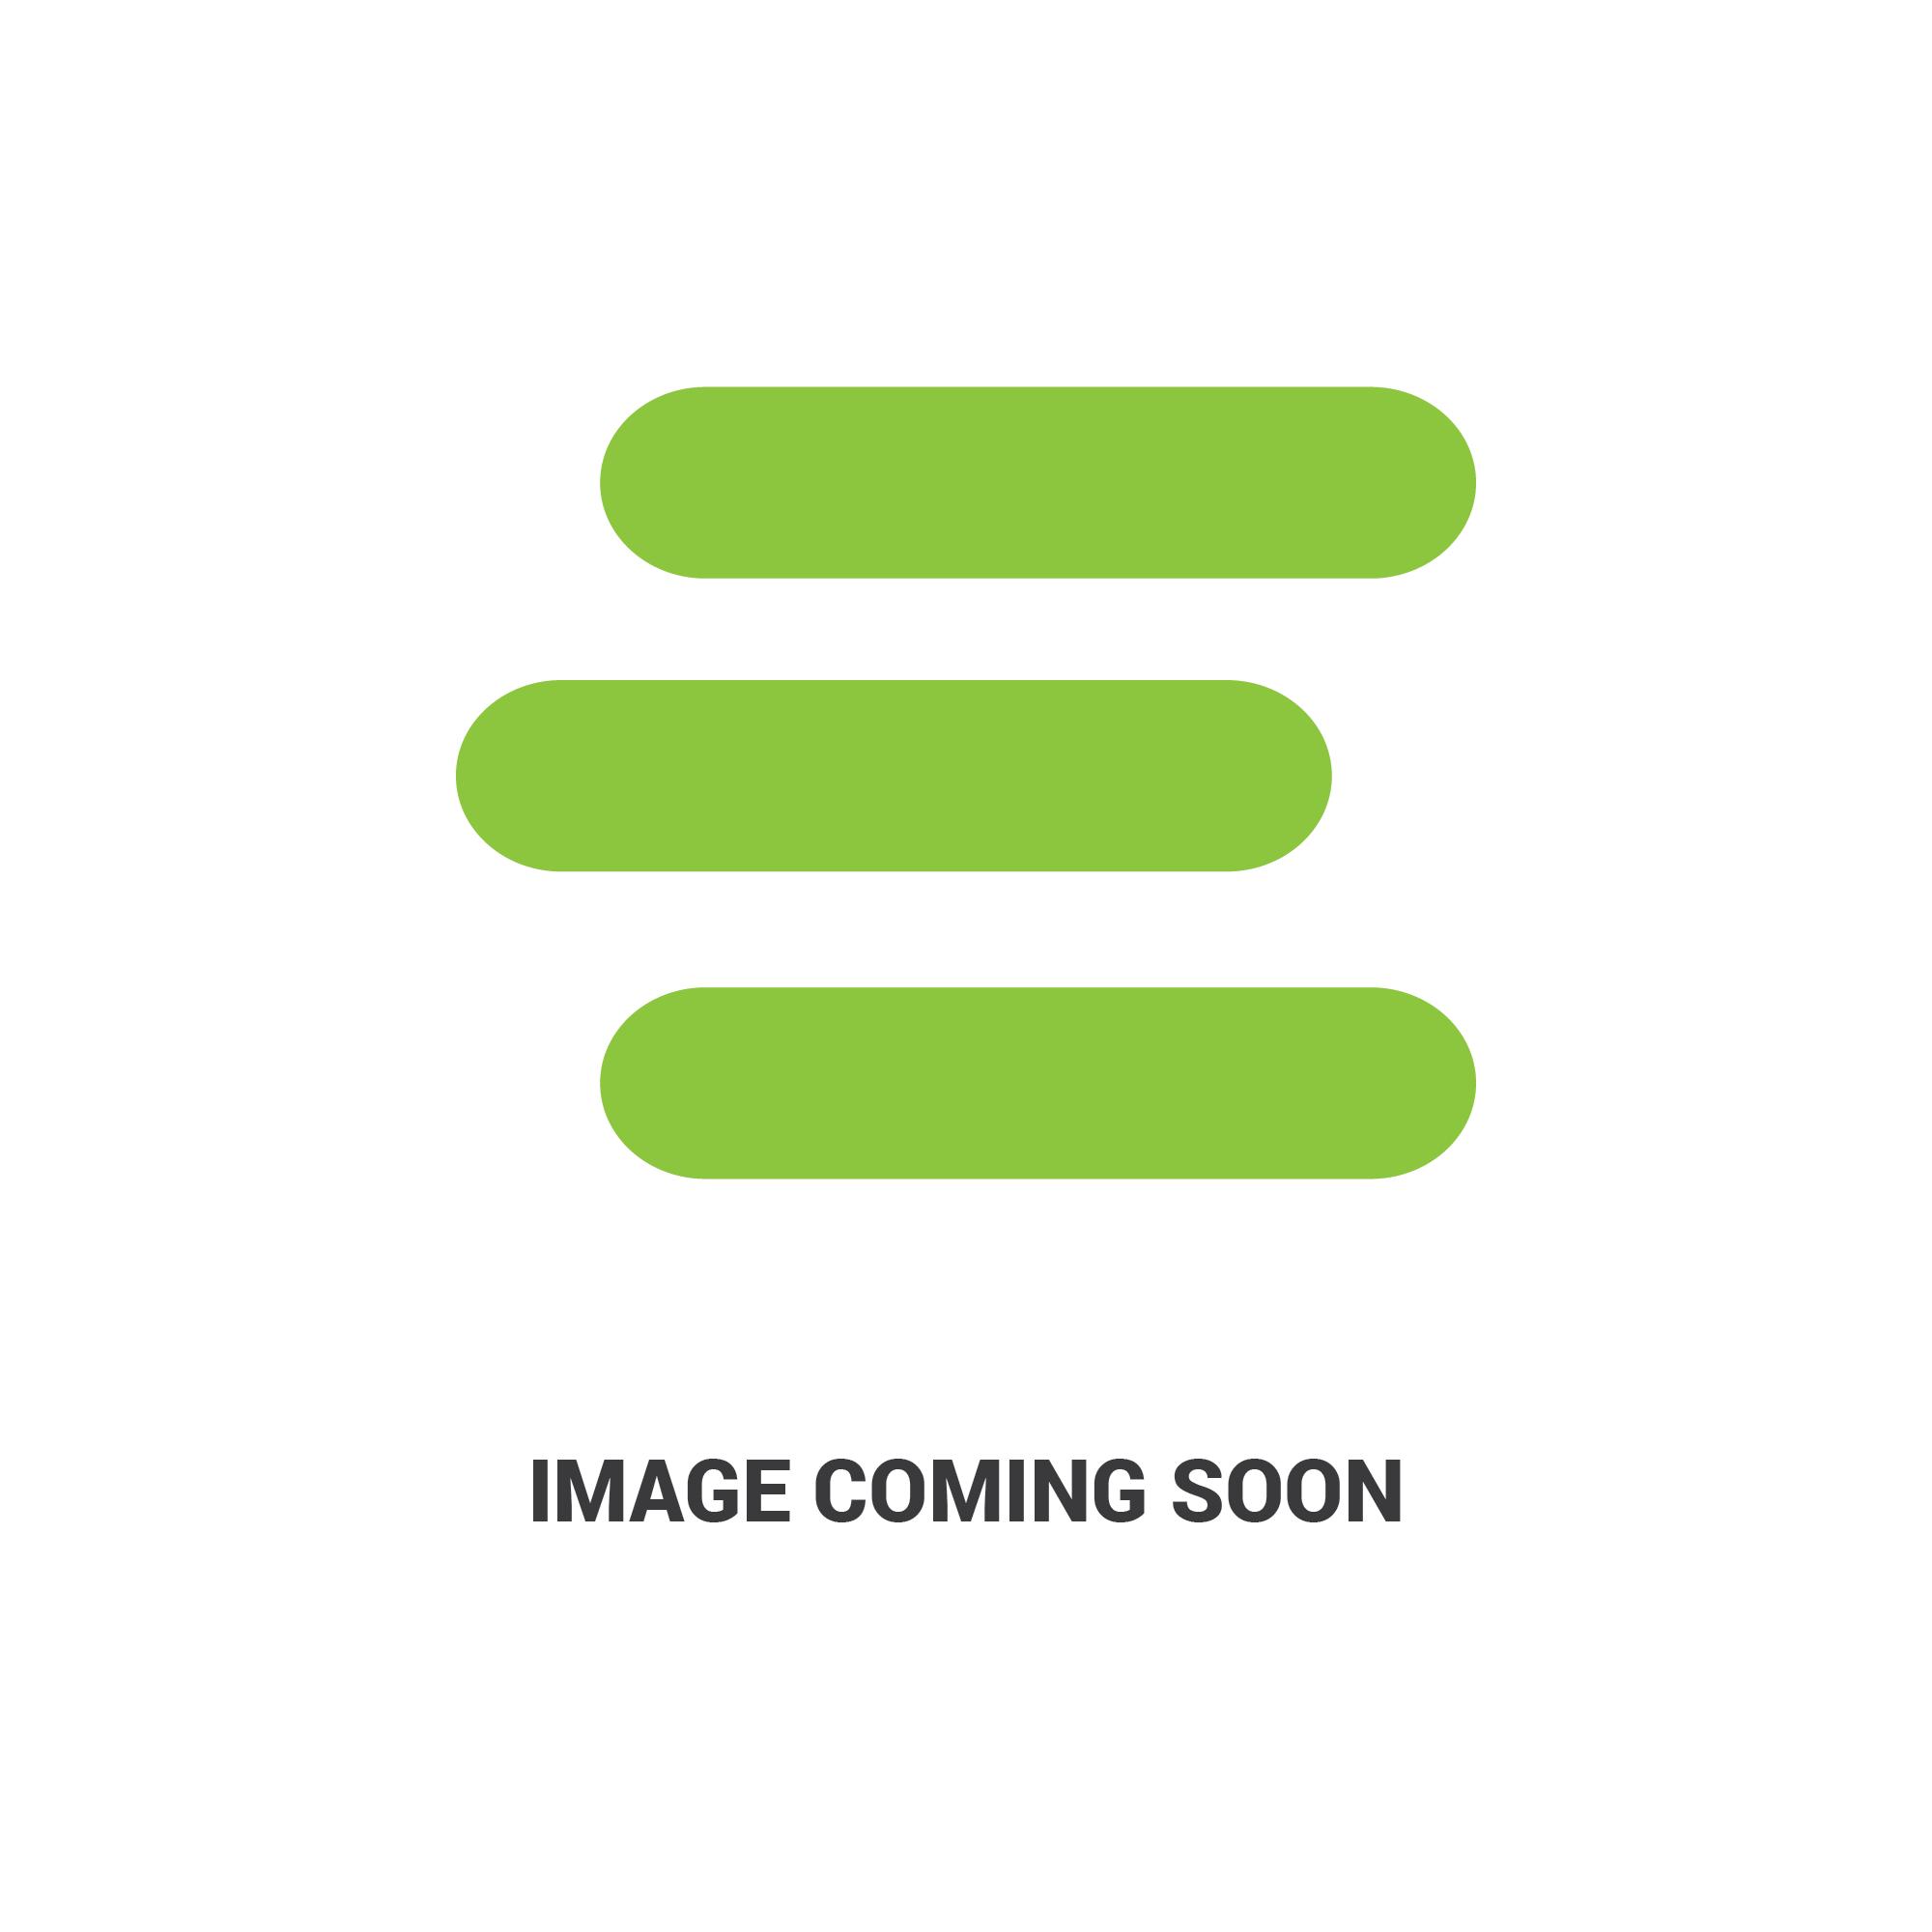 E-3J080-10870edit 5.jpg